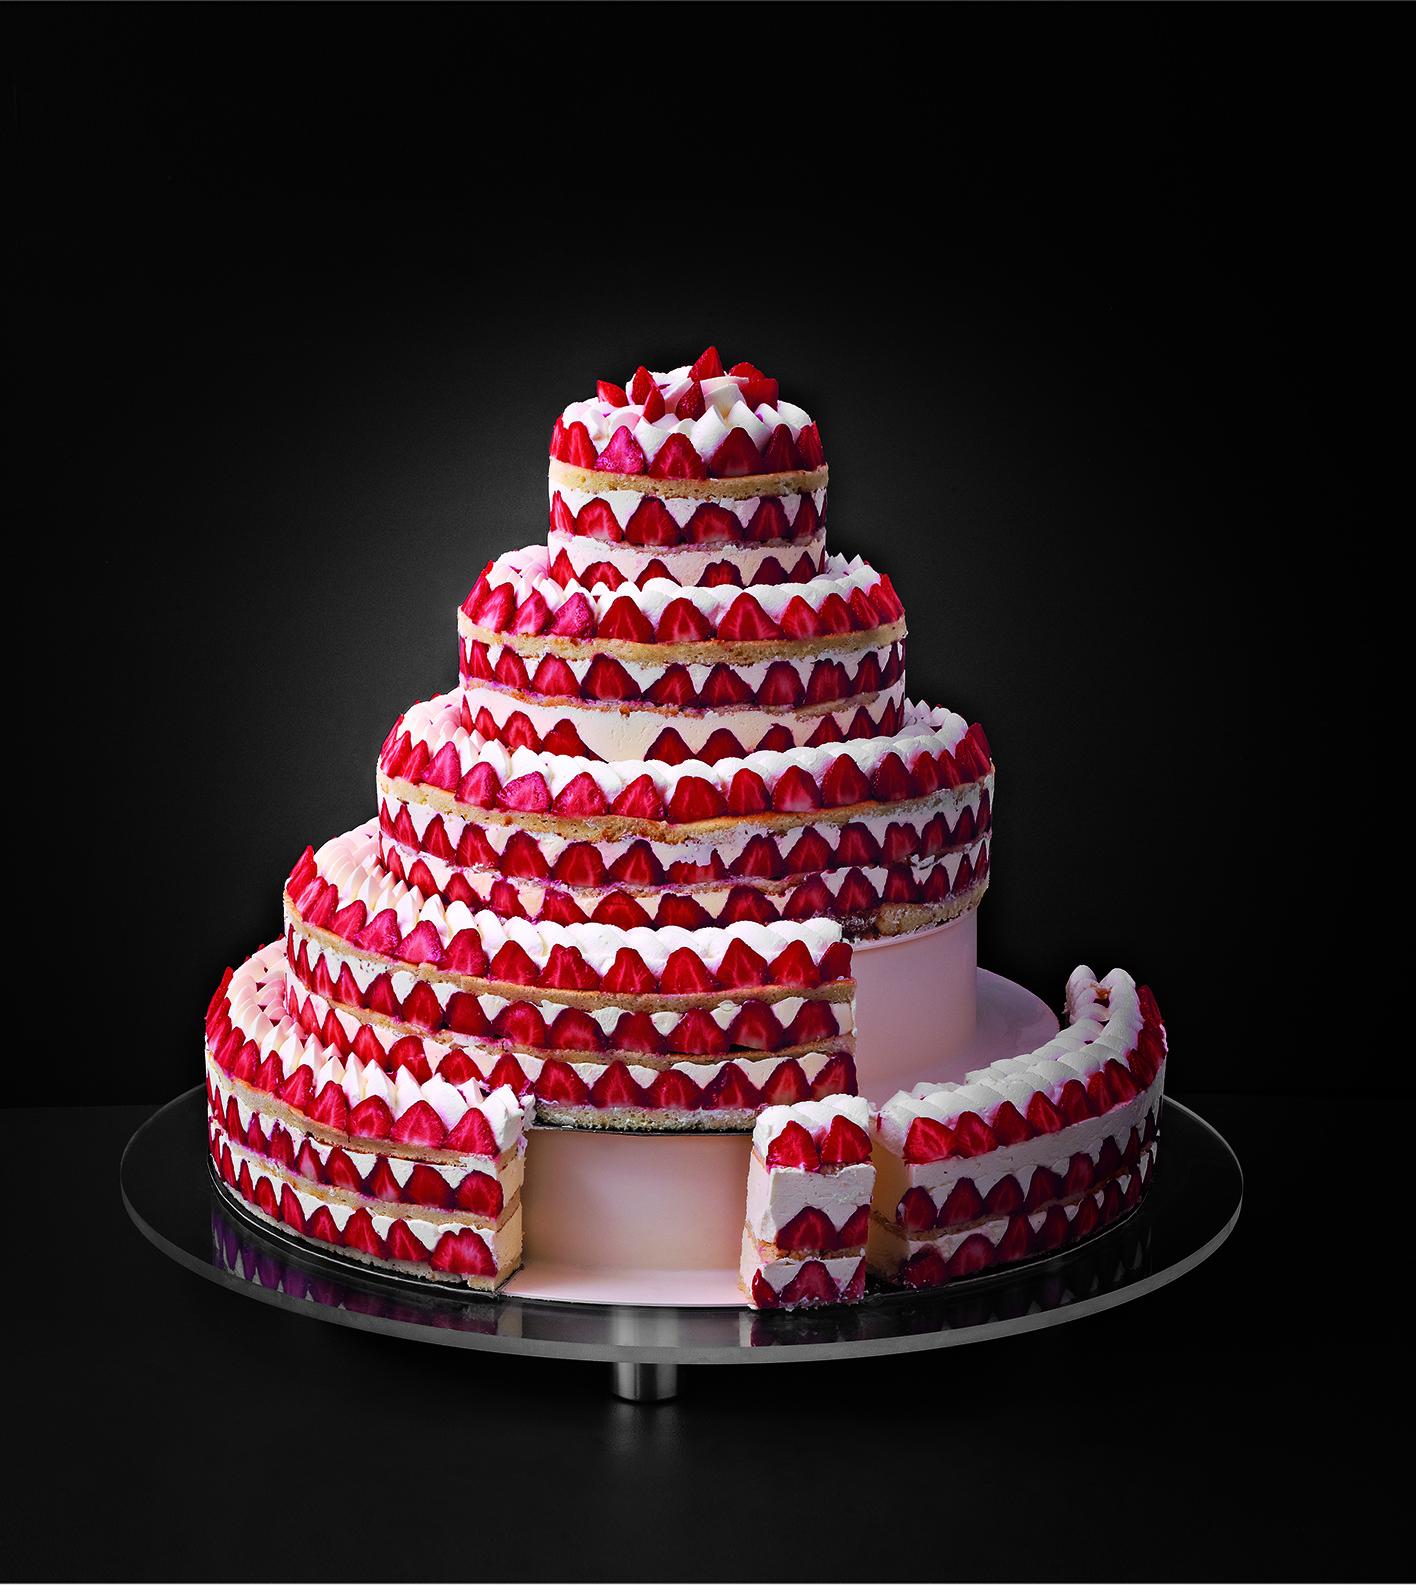 cercle en inox 16 cm pour wedding cake rond 681901 matfer. Black Bedroom Furniture Sets. Home Design Ideas